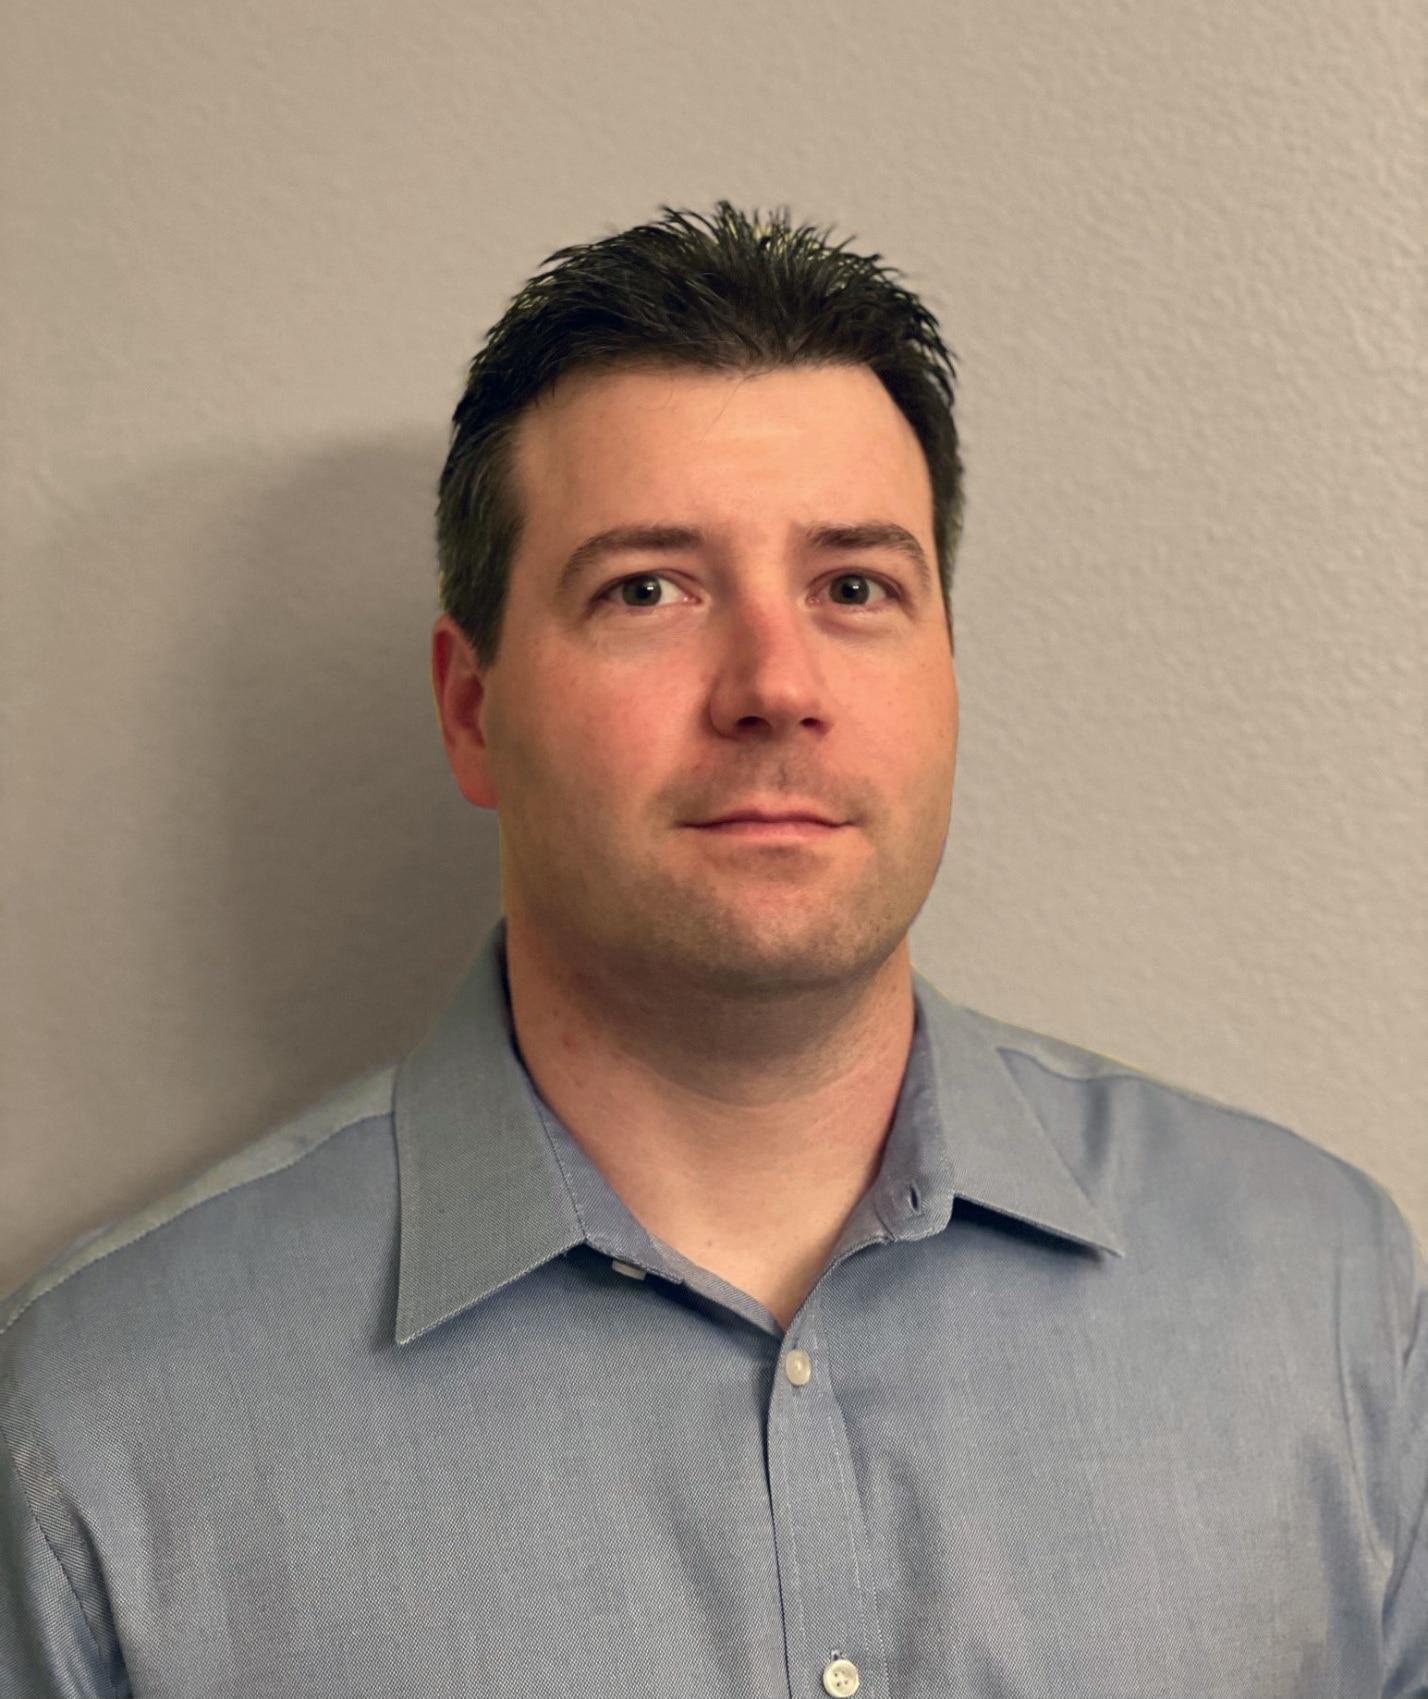 Clint Modesitt (Director of Professional Services)